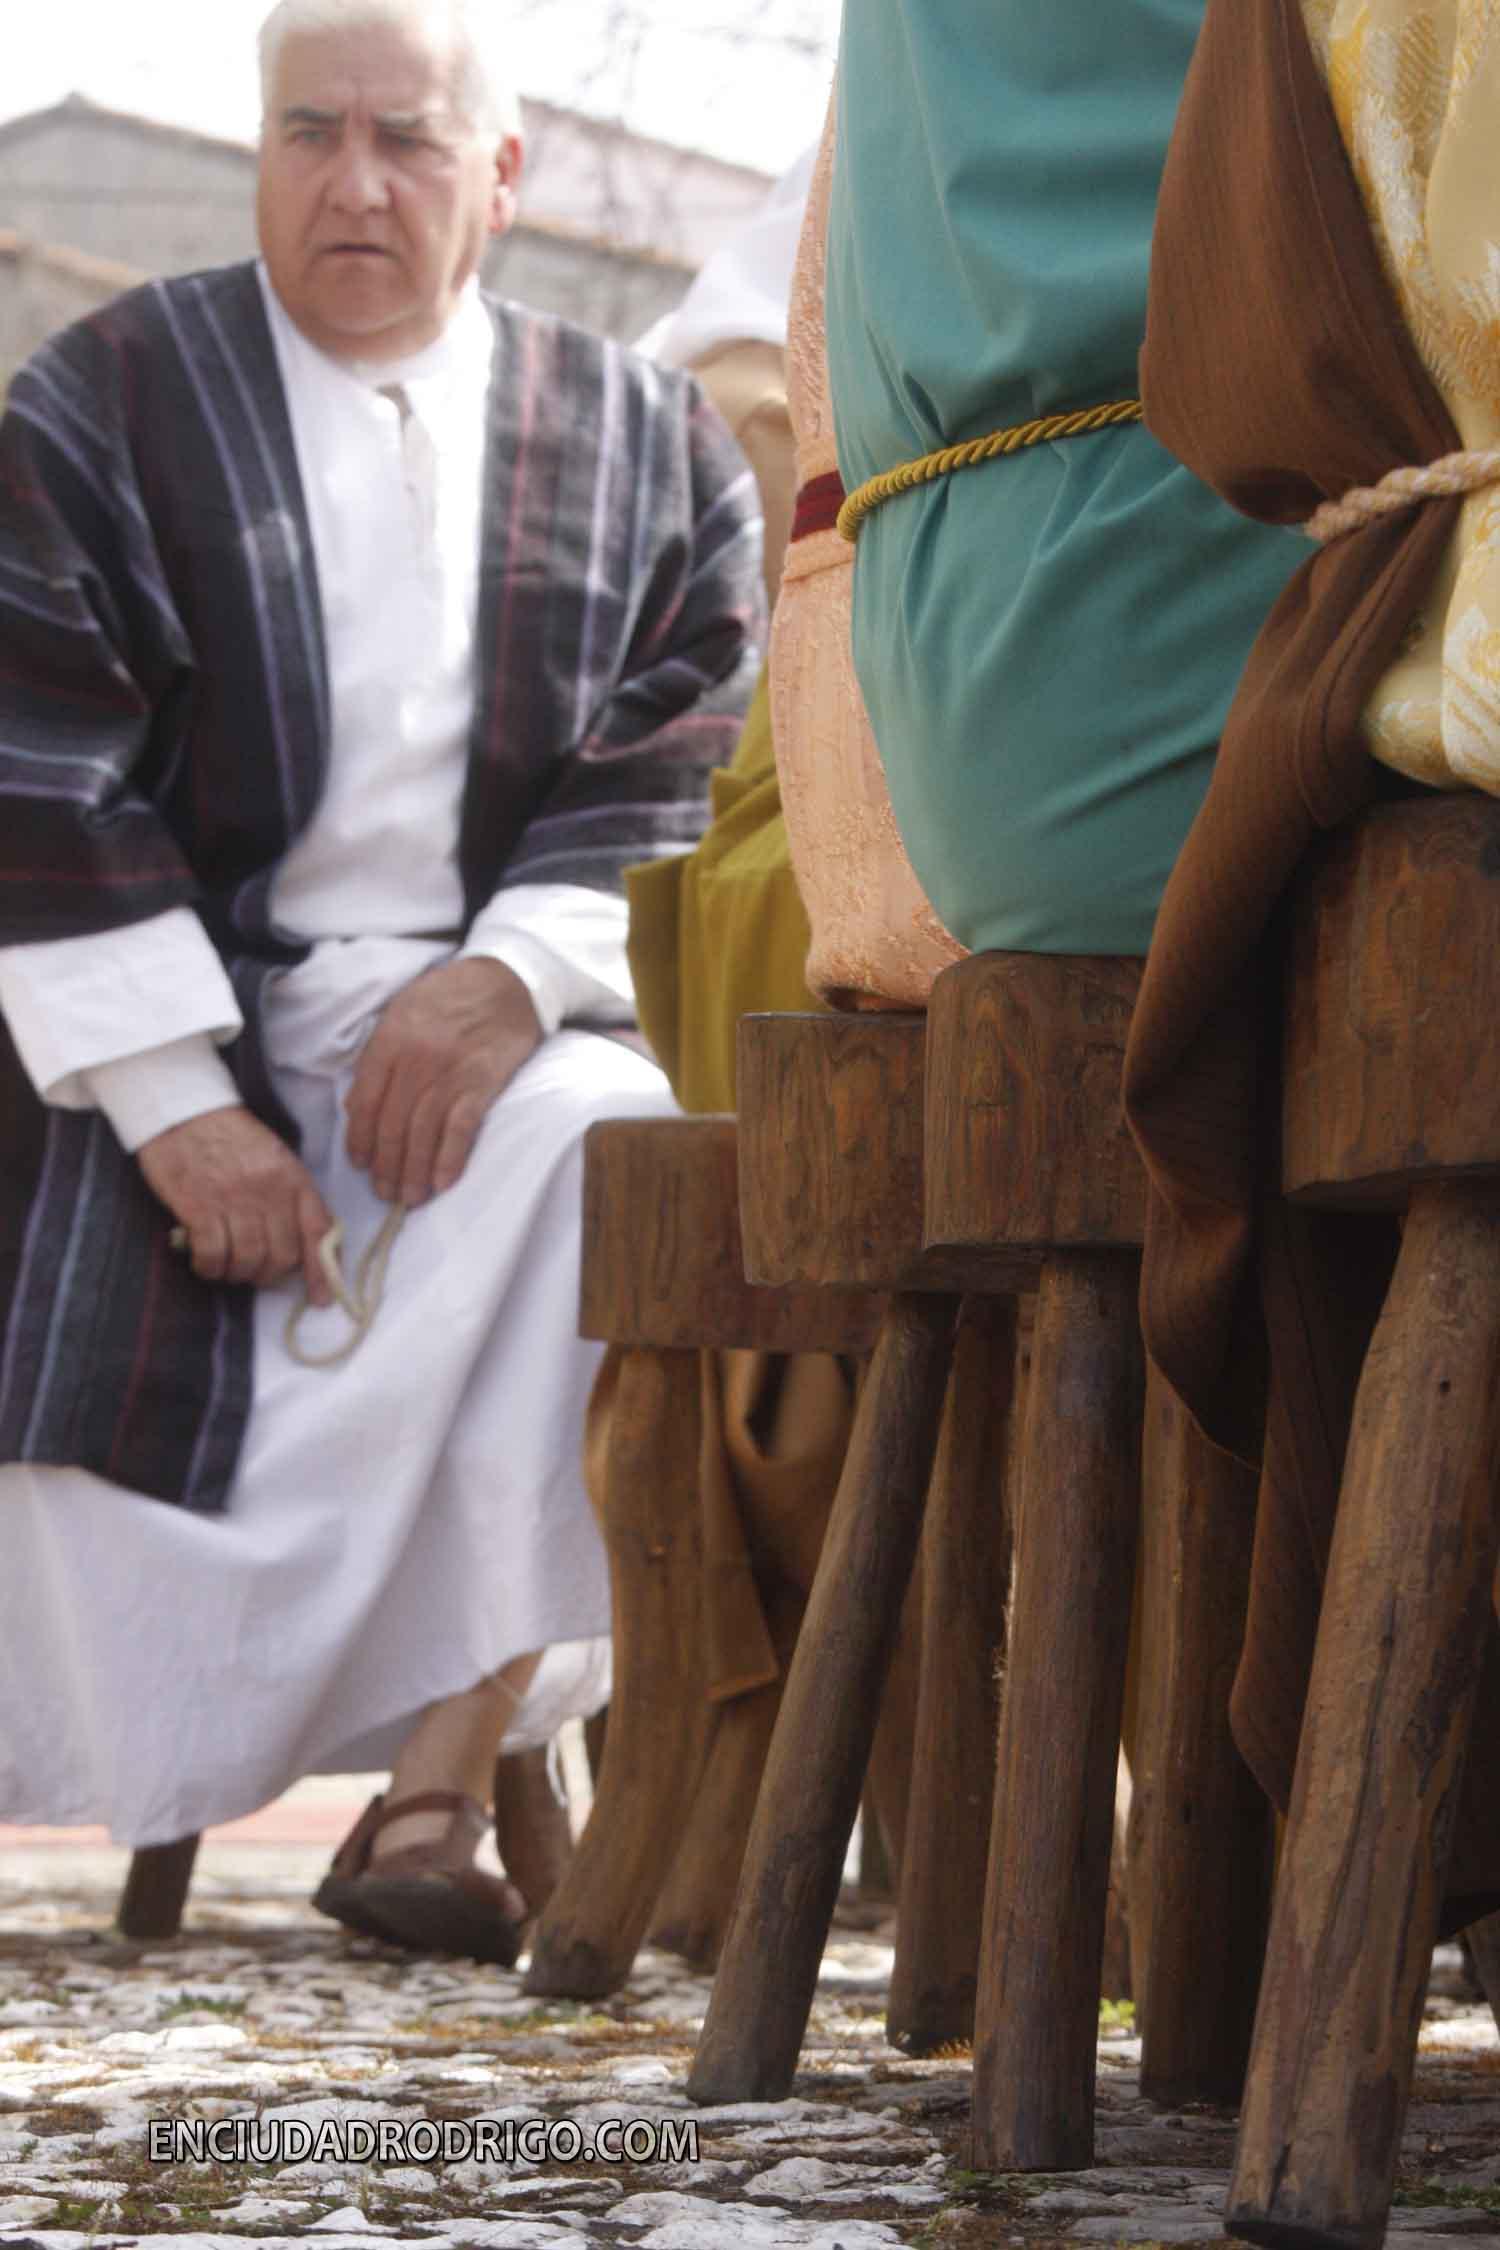 Pasin Recogimiento Y Muchedumbre Acompaan Al Va Crucis Viviente T Shirt Fredom Buterfly Wanita B0020 Mg 1838